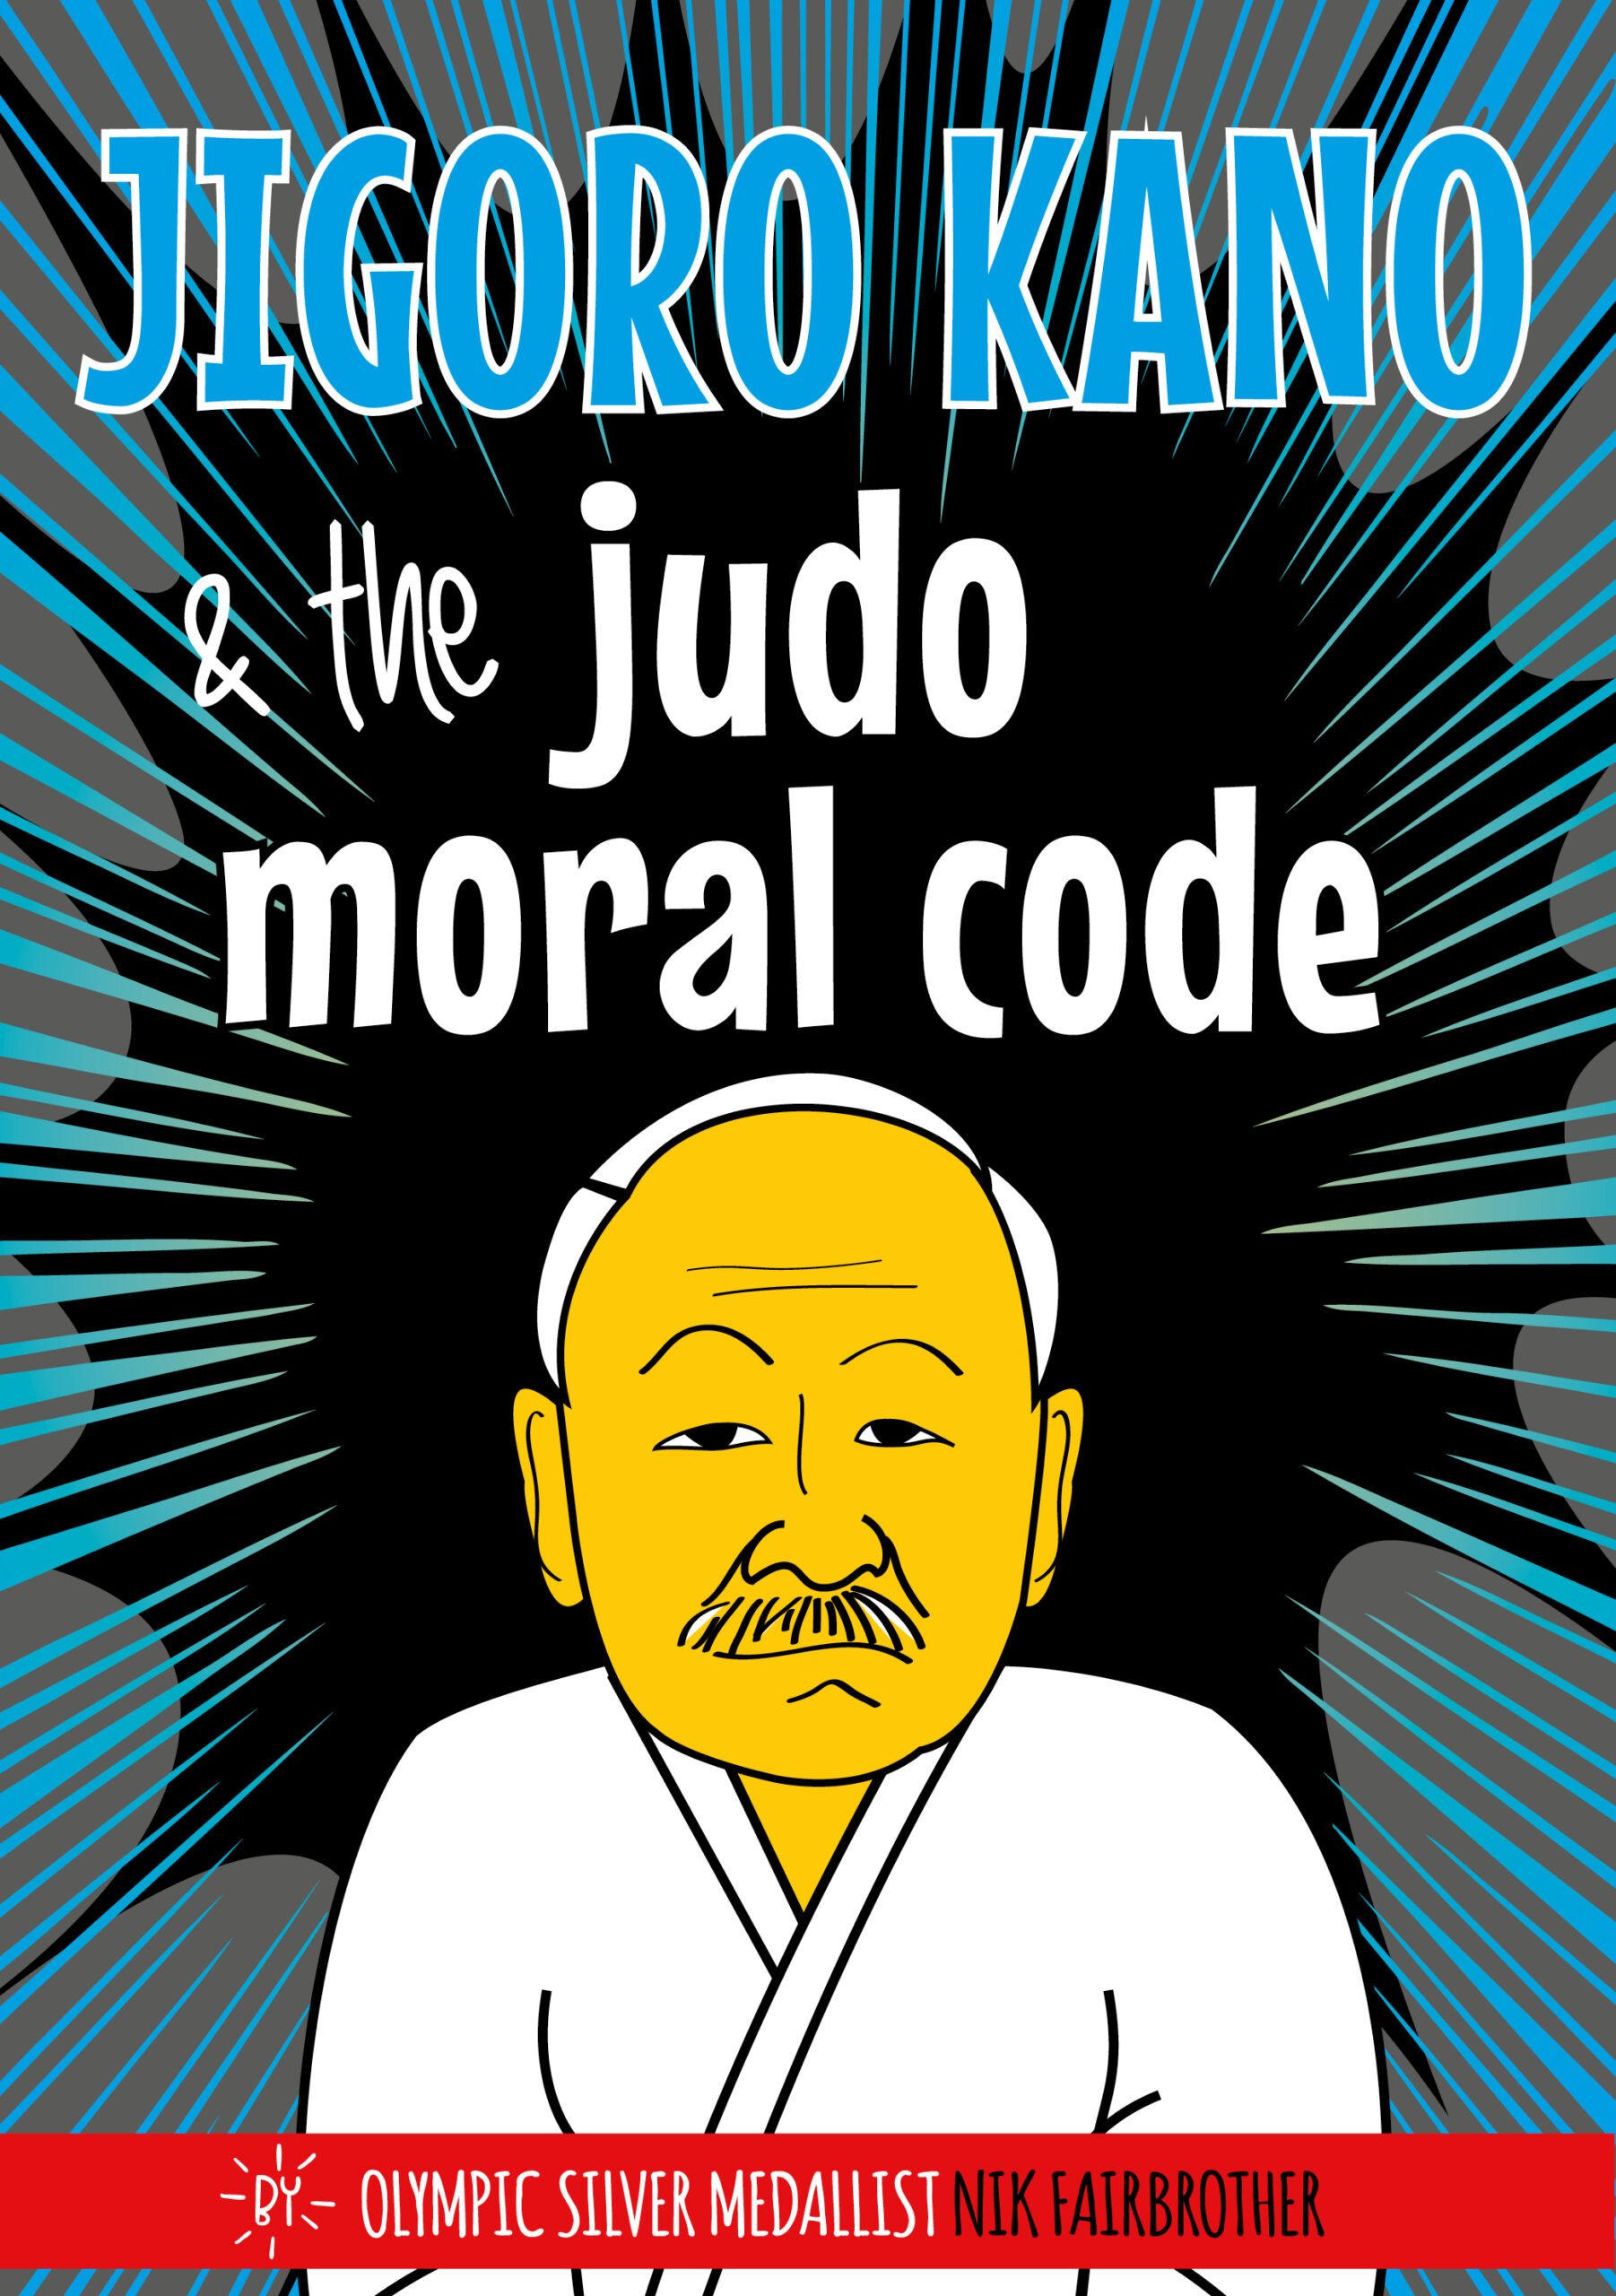 Jigoro Kano and the Moral Code book